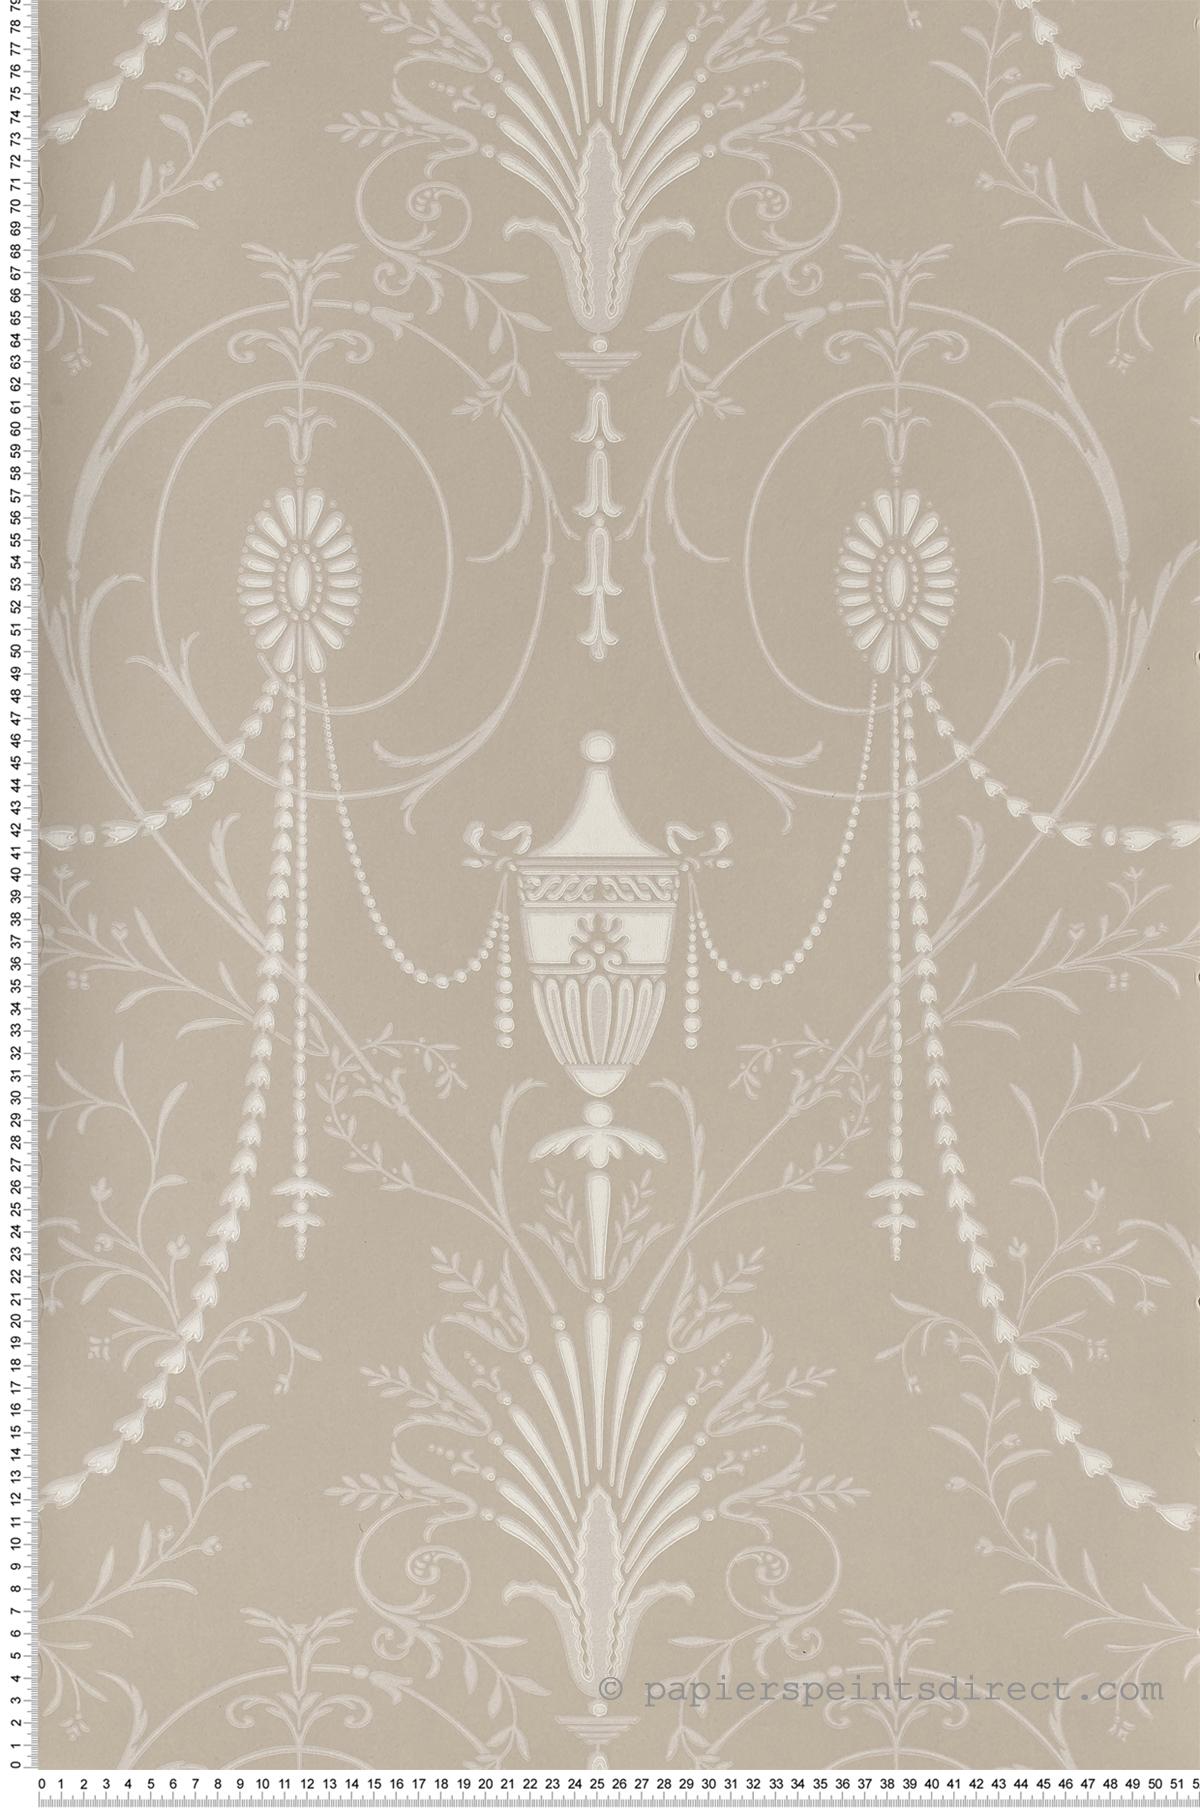 London Wallpapers II, Marlborough, référence : 0273MAPURBE